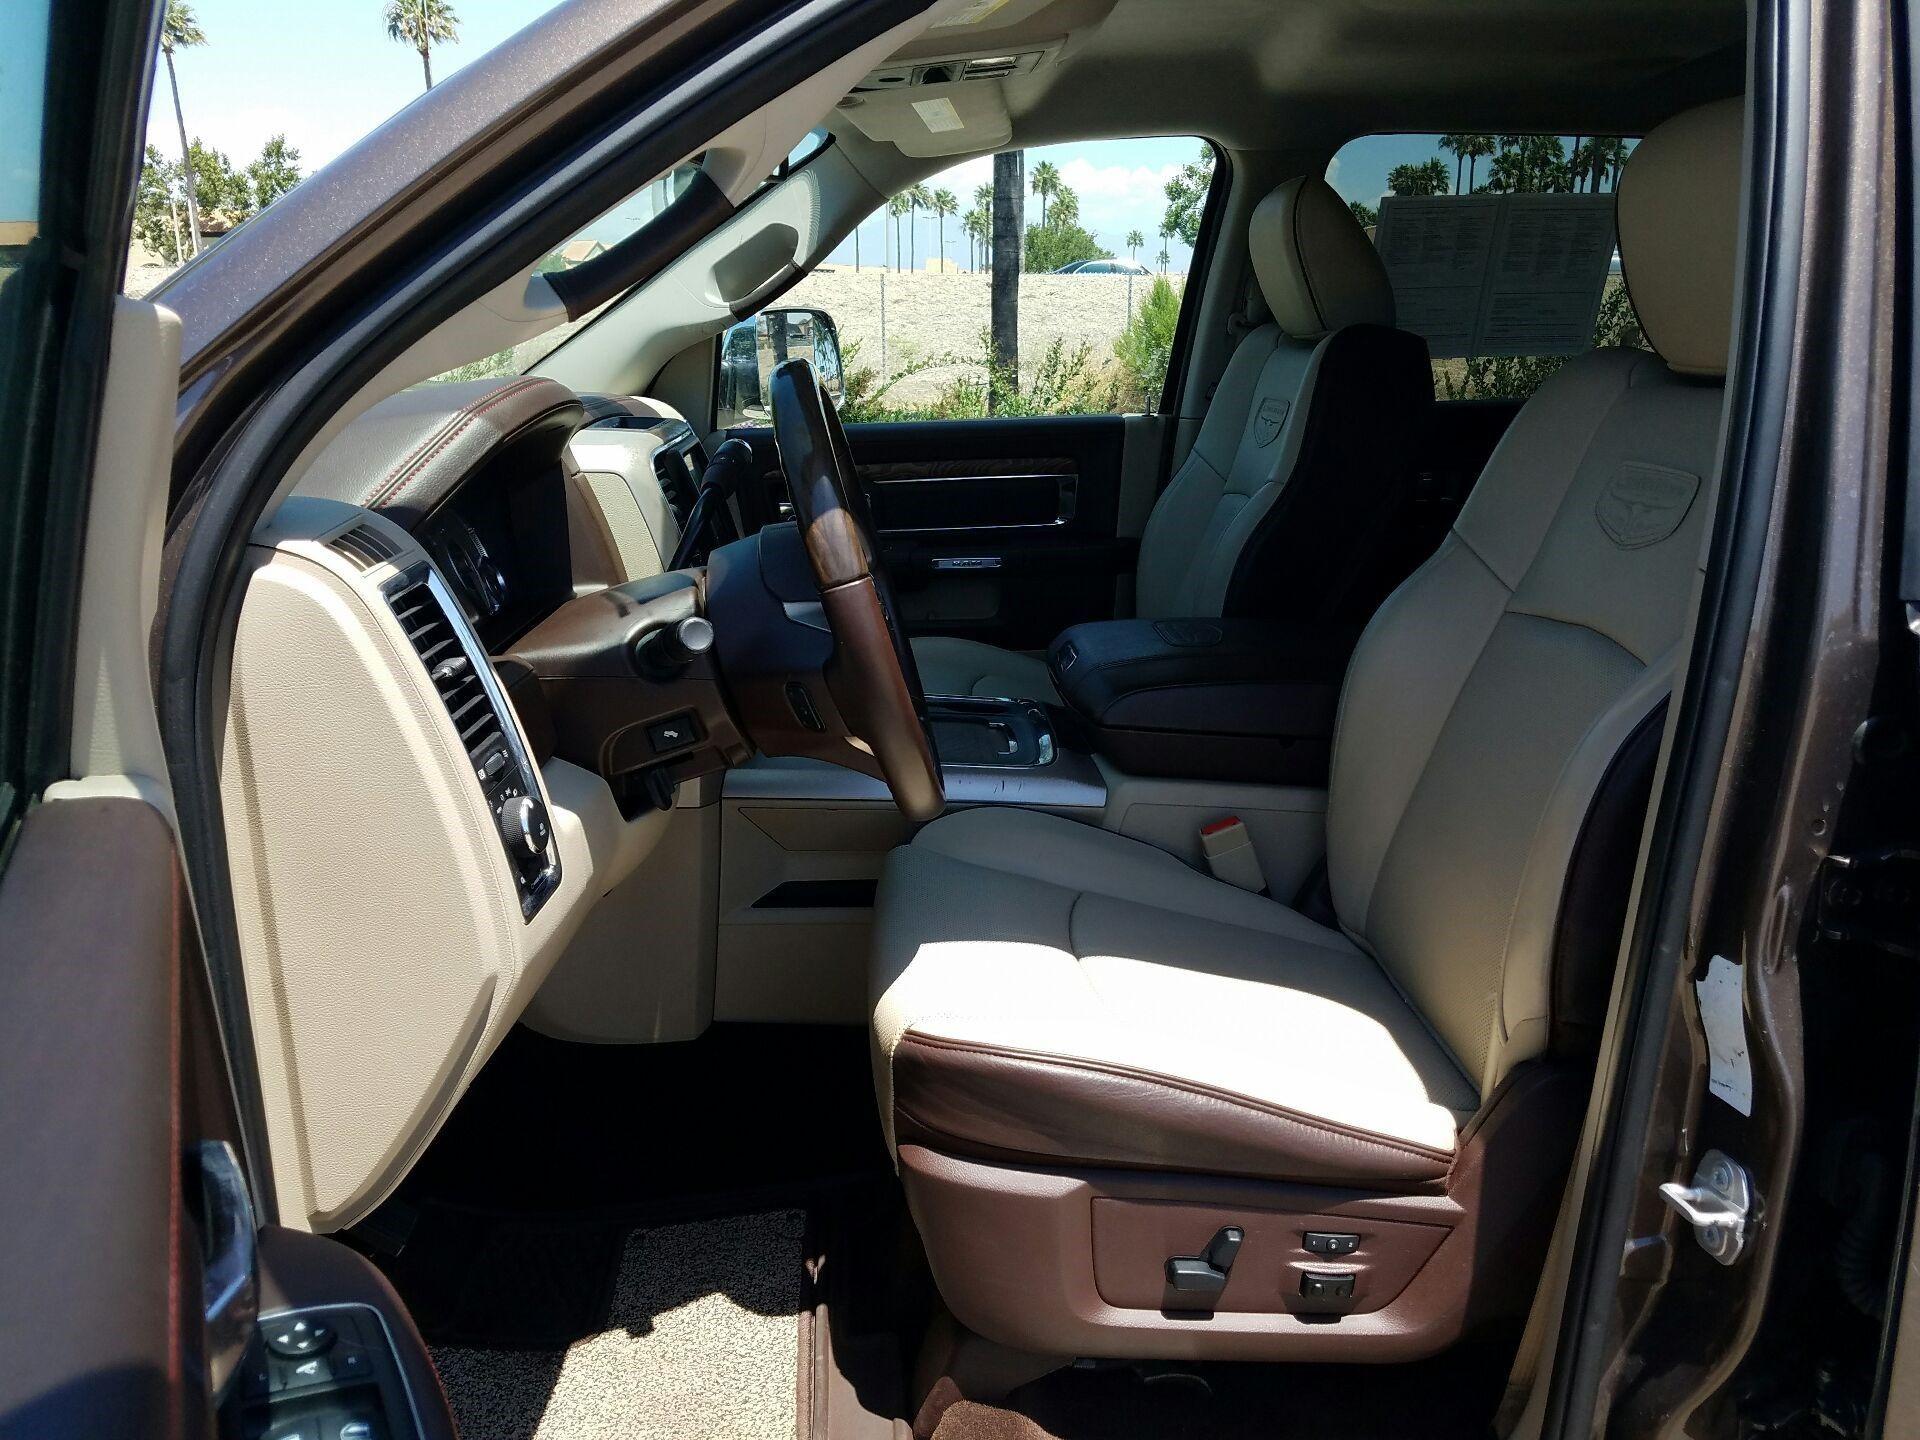 2018 Dodge Ram 3500 - Cream Seats | Tracy Marie Lewis | www.stuffnthingz.com